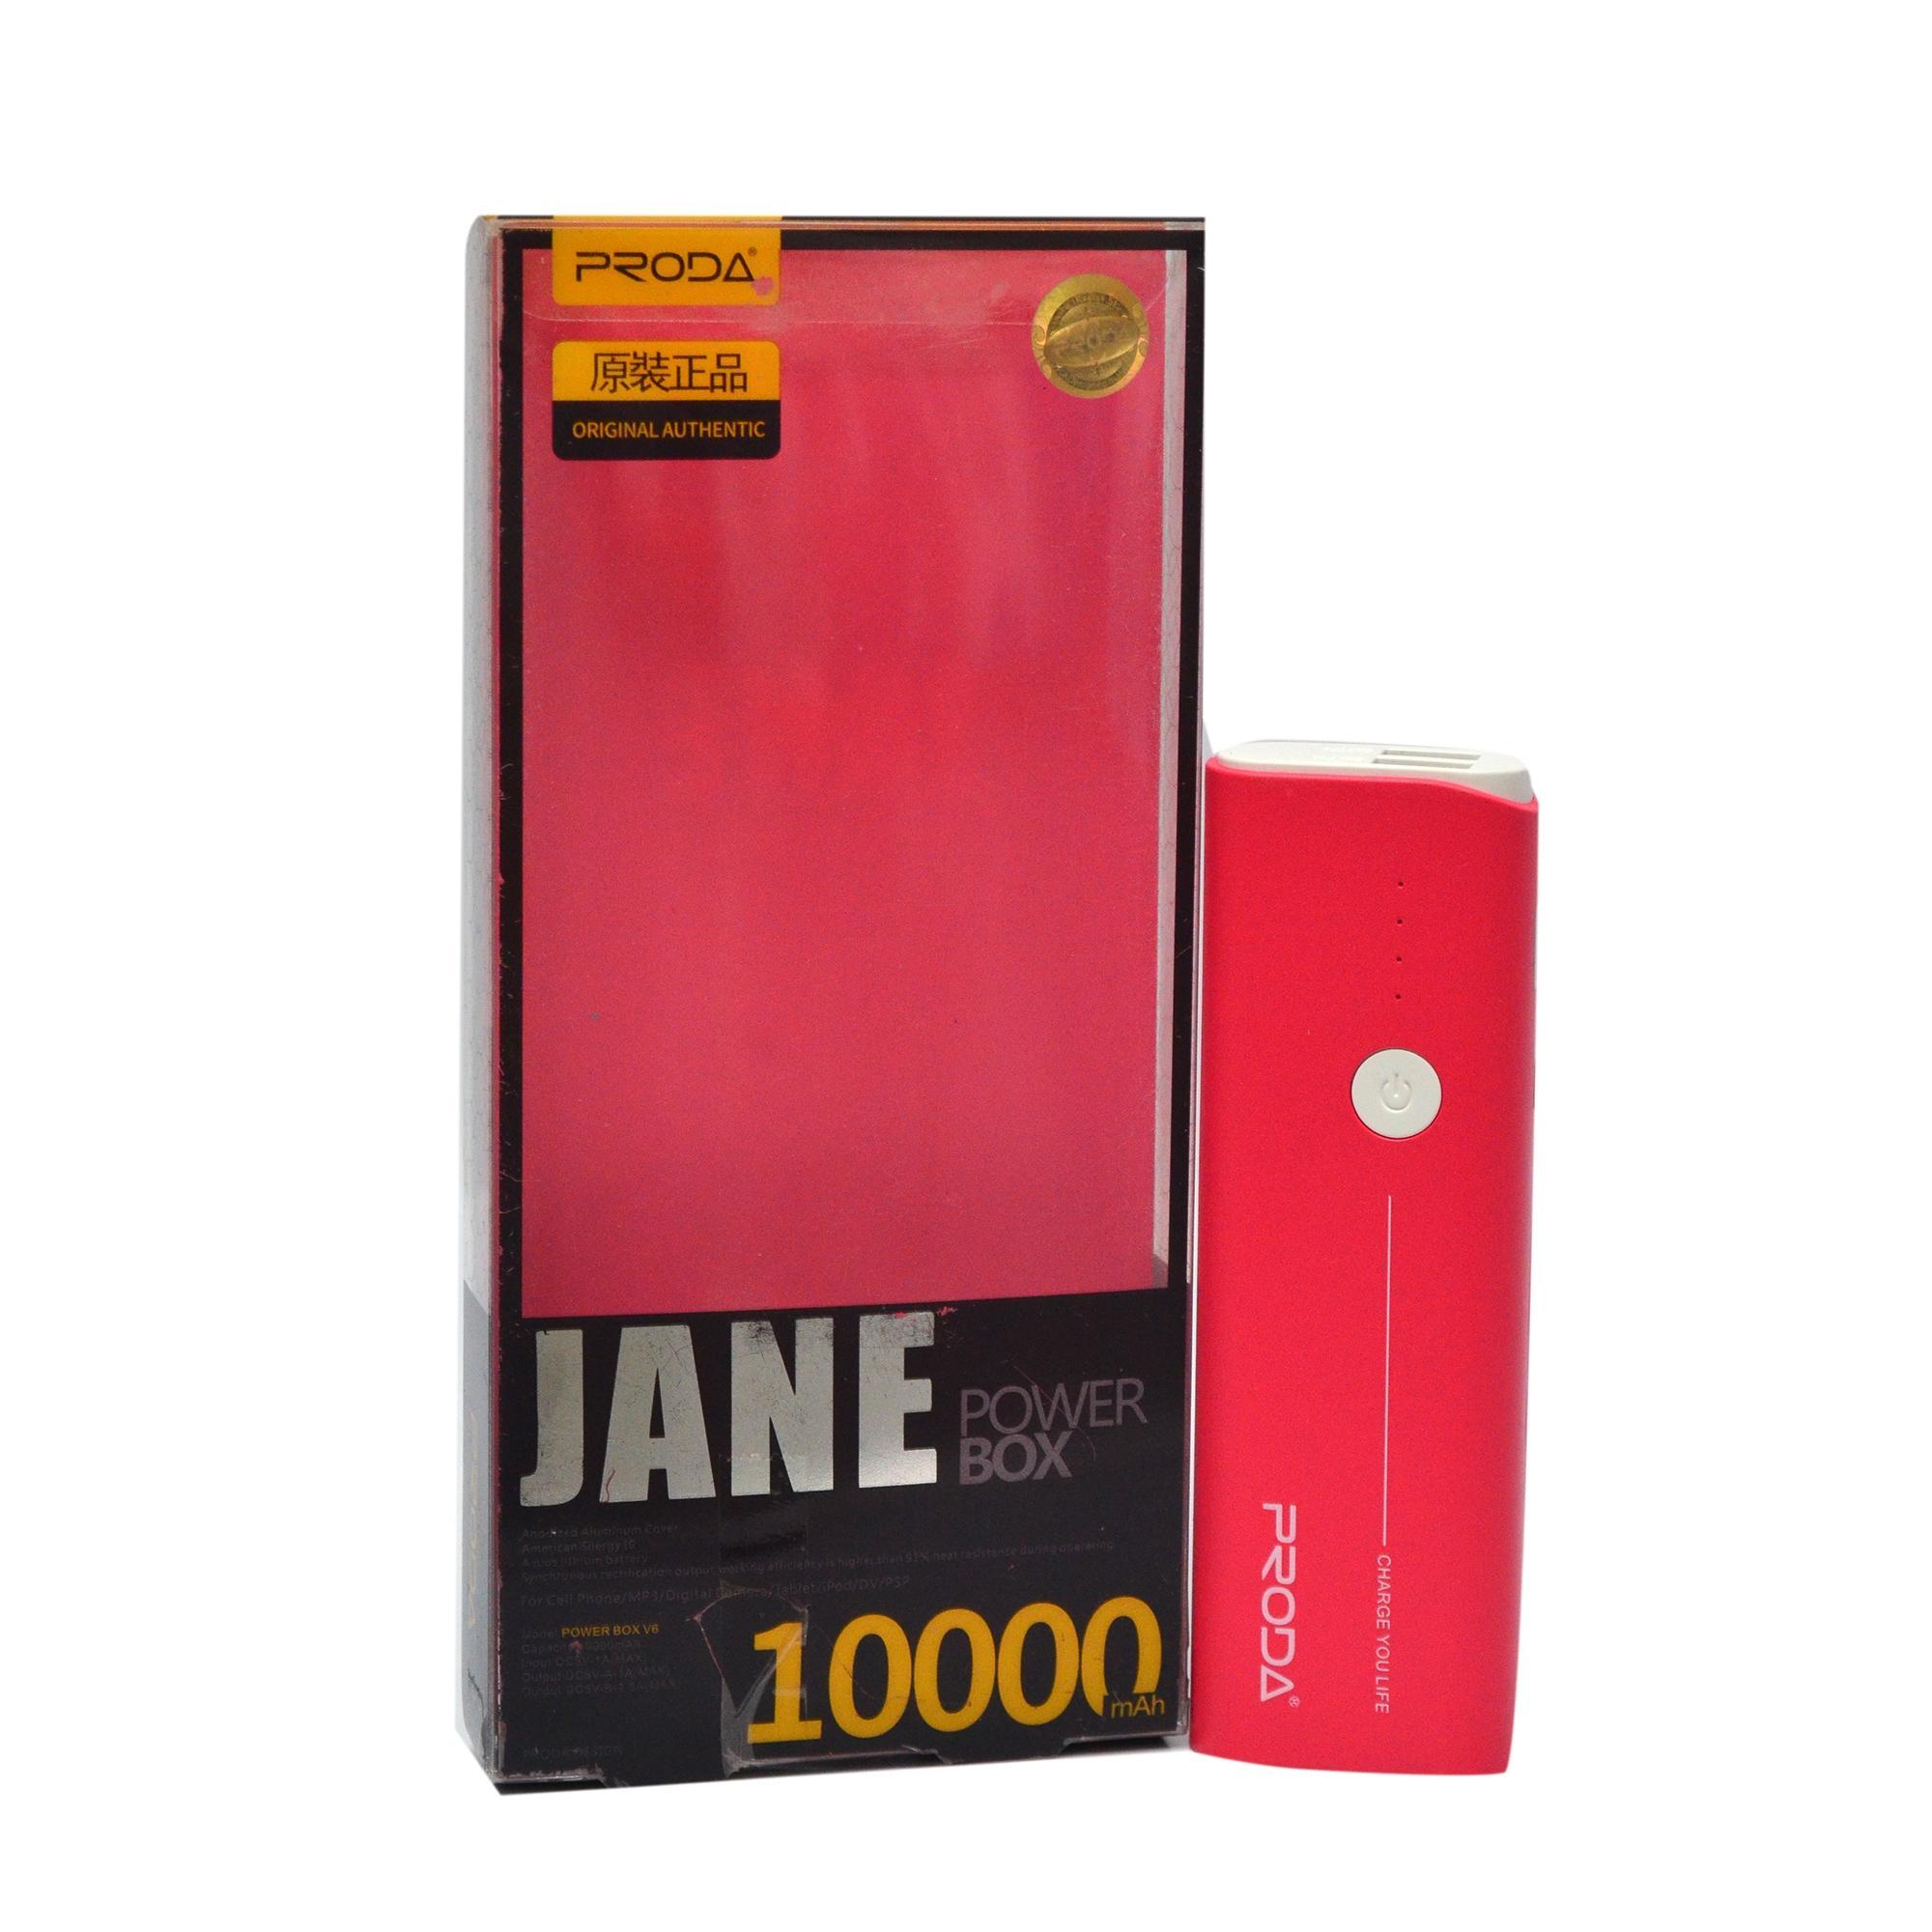 Remax Proda Jane Series Powerbank 10000mAh - Red